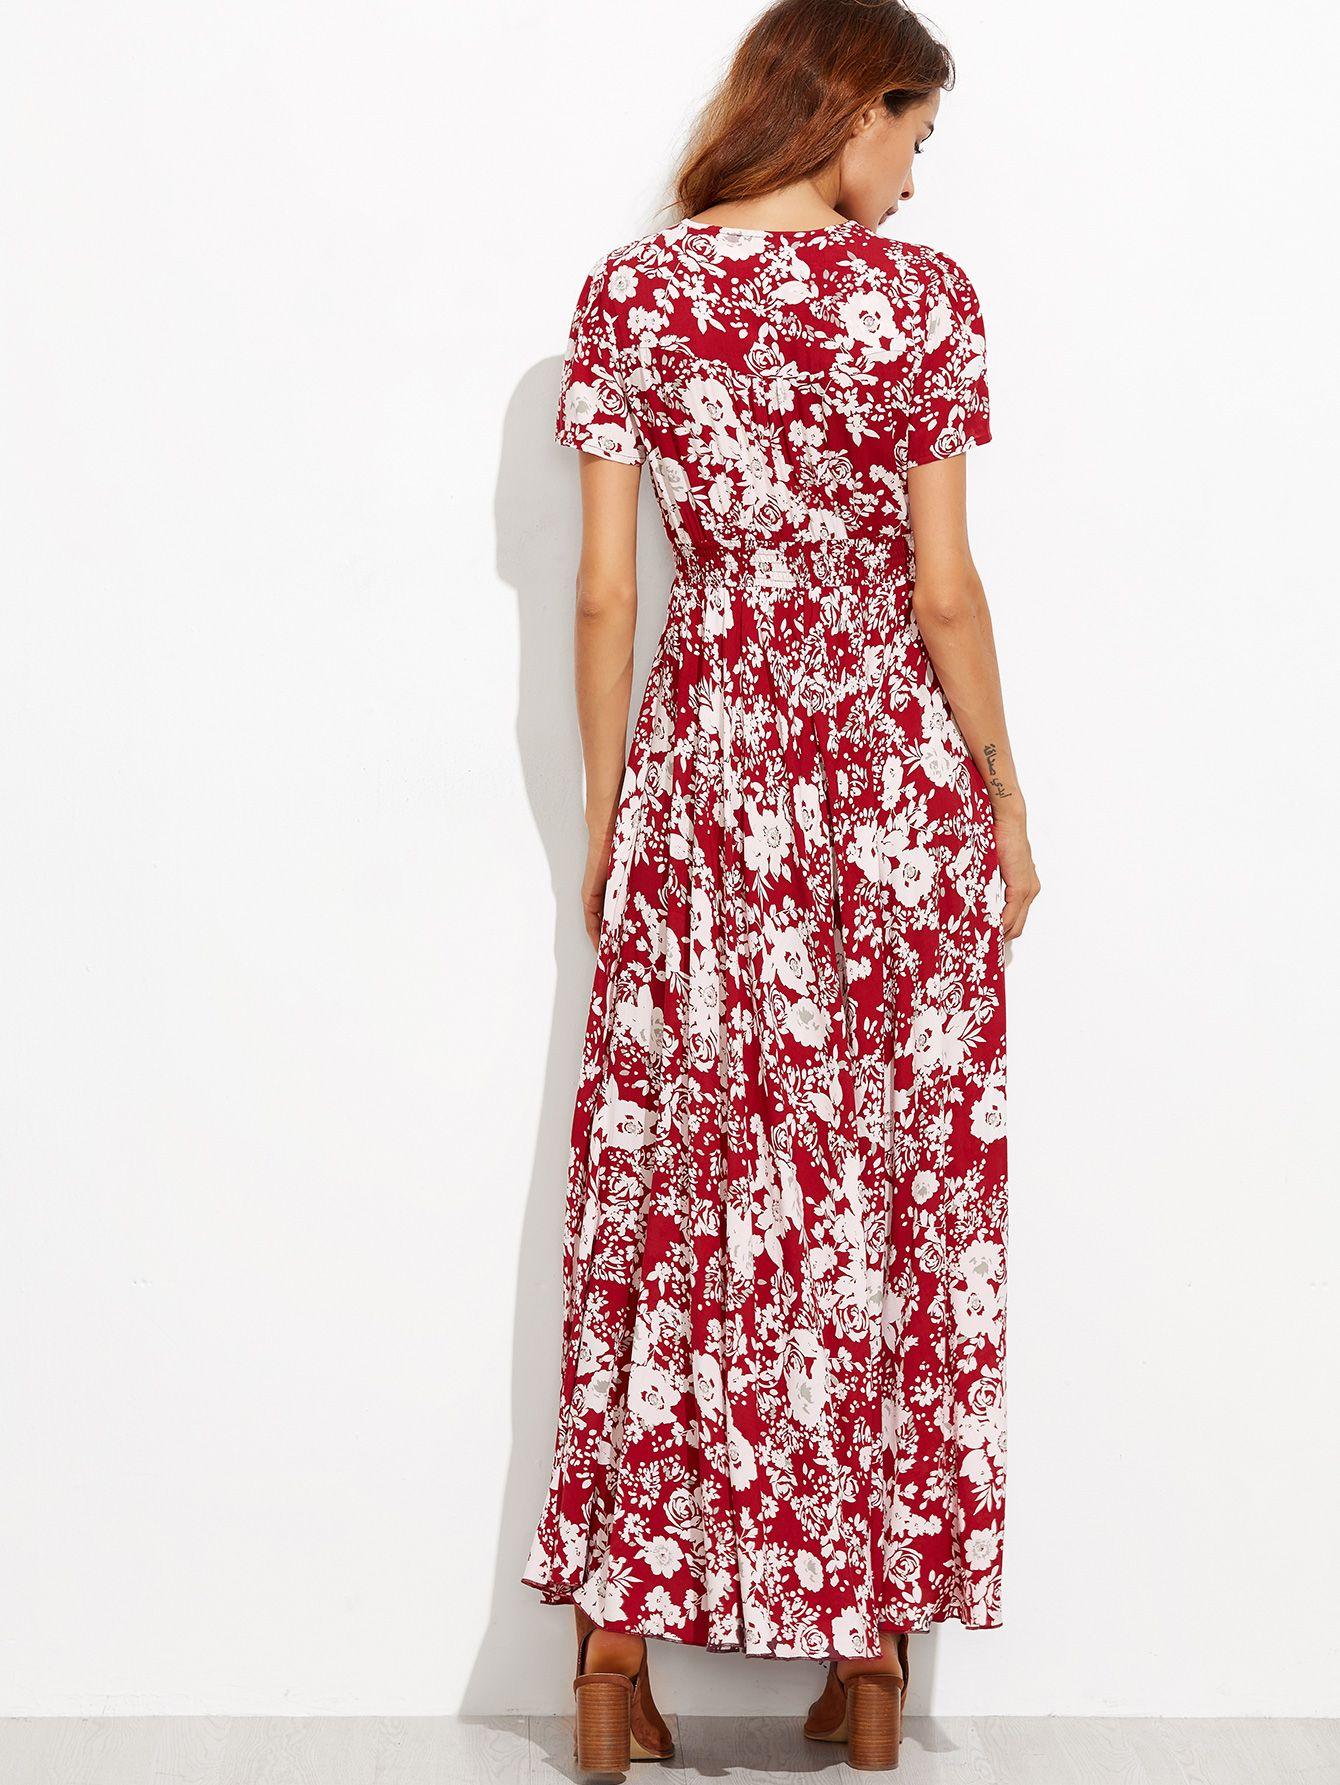 8e4eeb793ed2 V-neckline Calico Print Tassel Tie Dress burgandy  amp  white floral